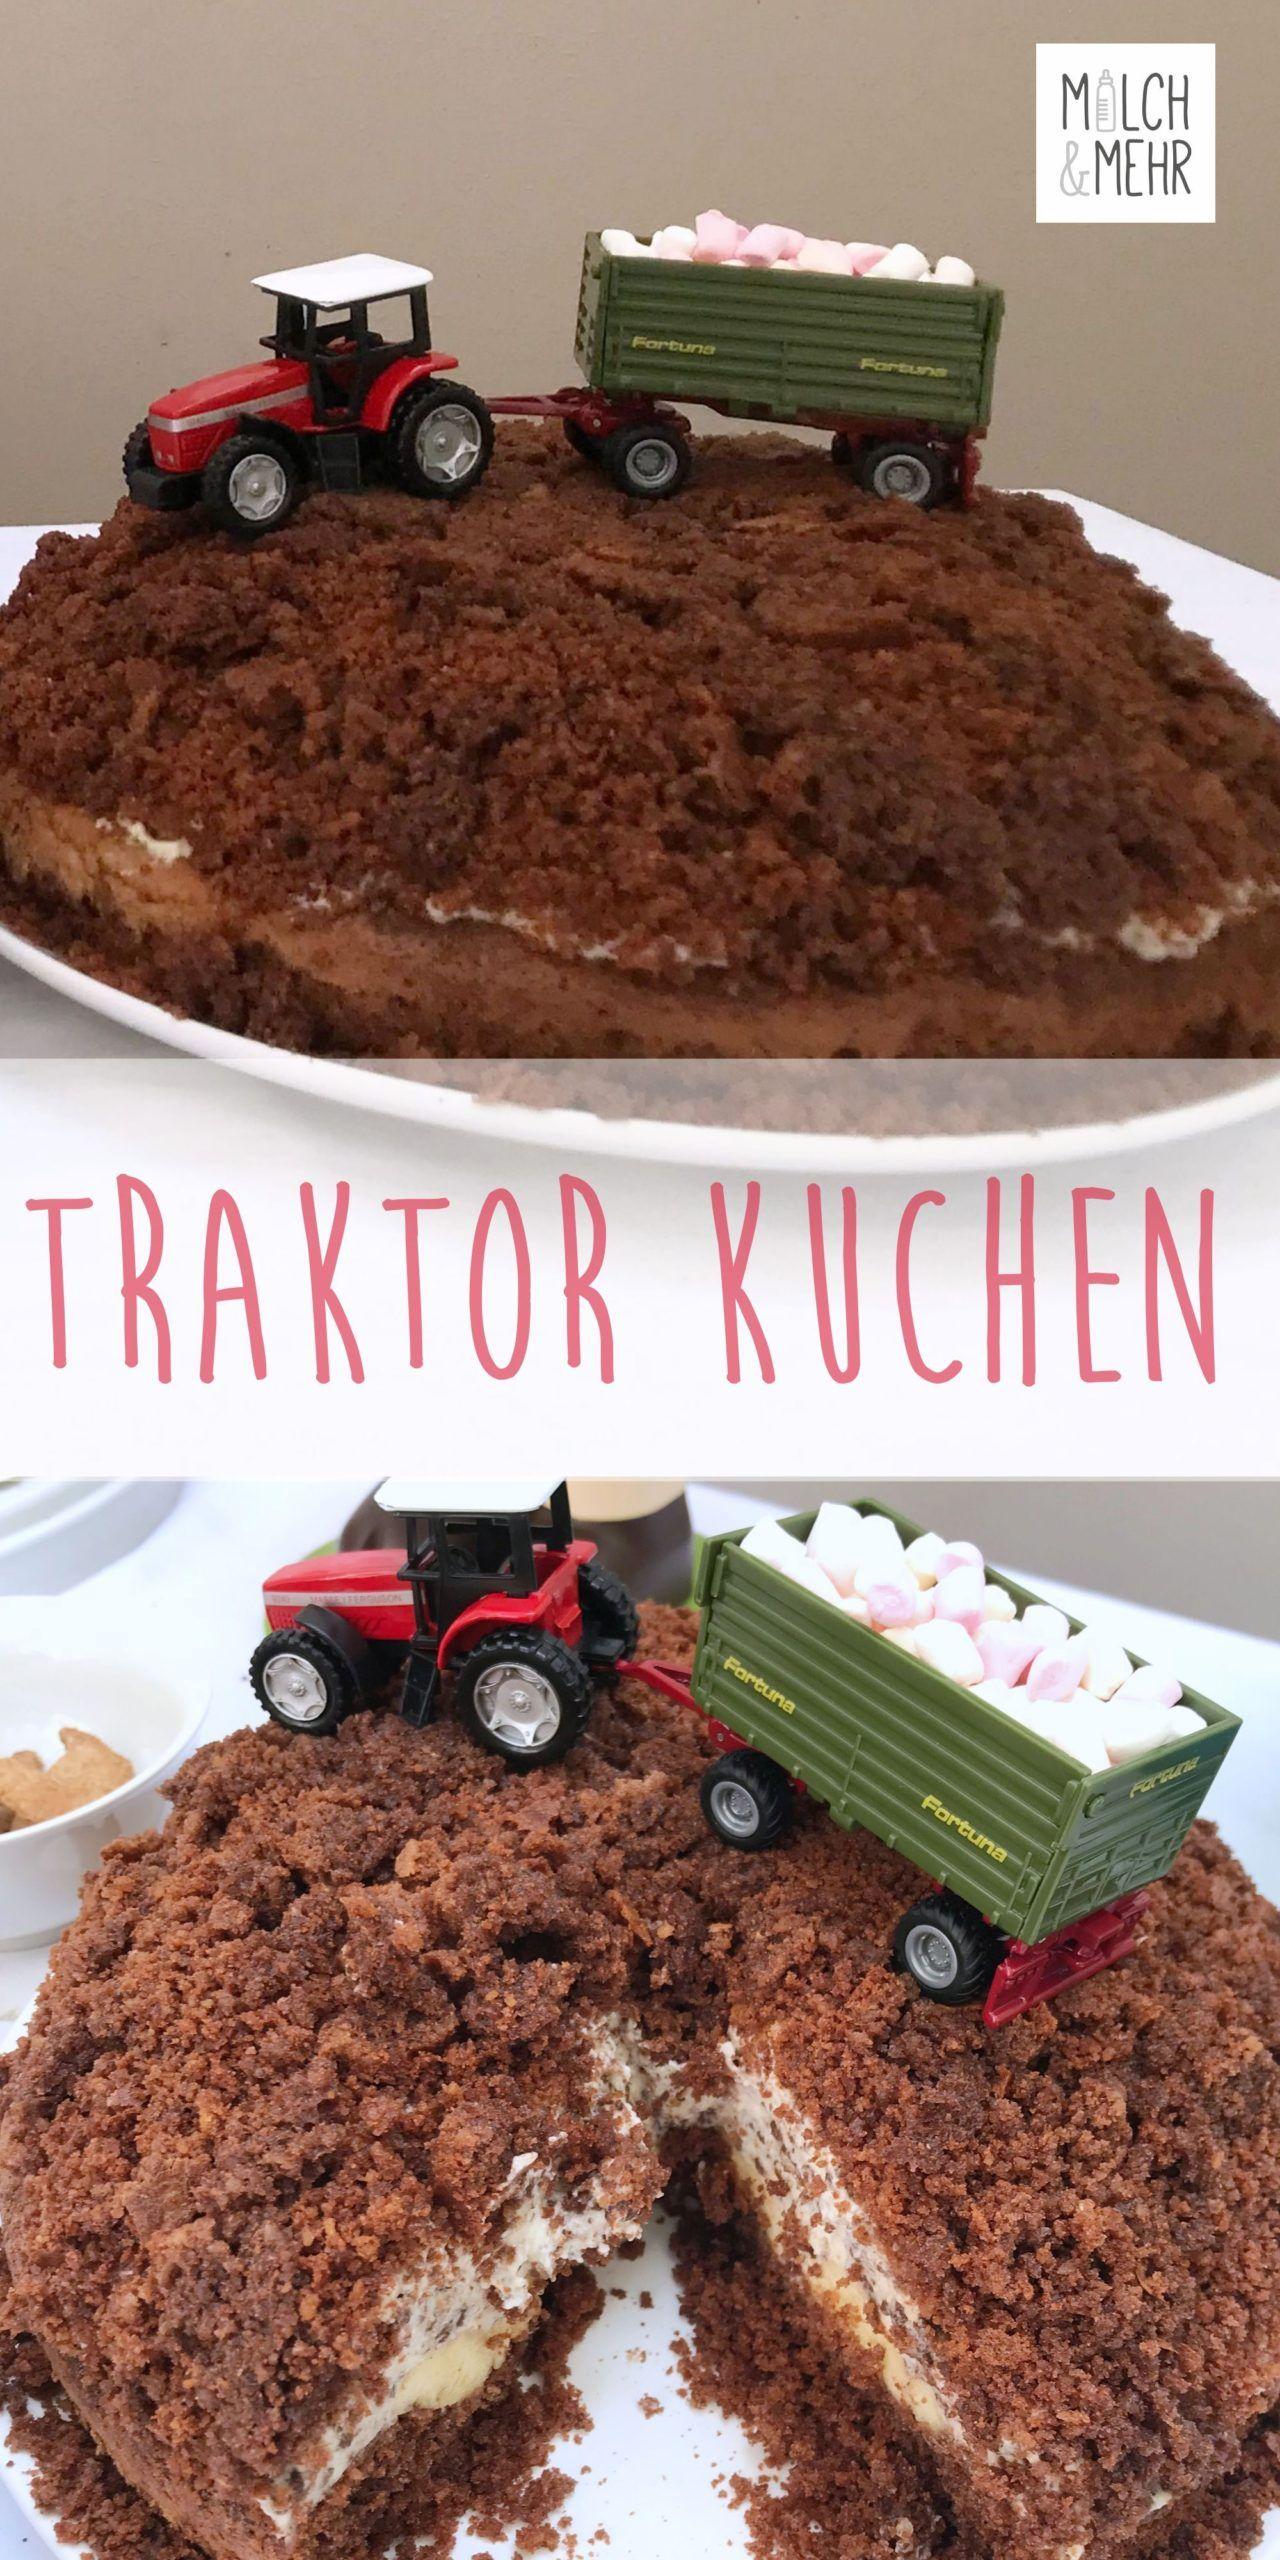 Traktor Kuchen Ohne Fondant In 2020 Traktor Kuchen Kuchen Mit Fondant Kuchen Kindergeburtstag Traktor